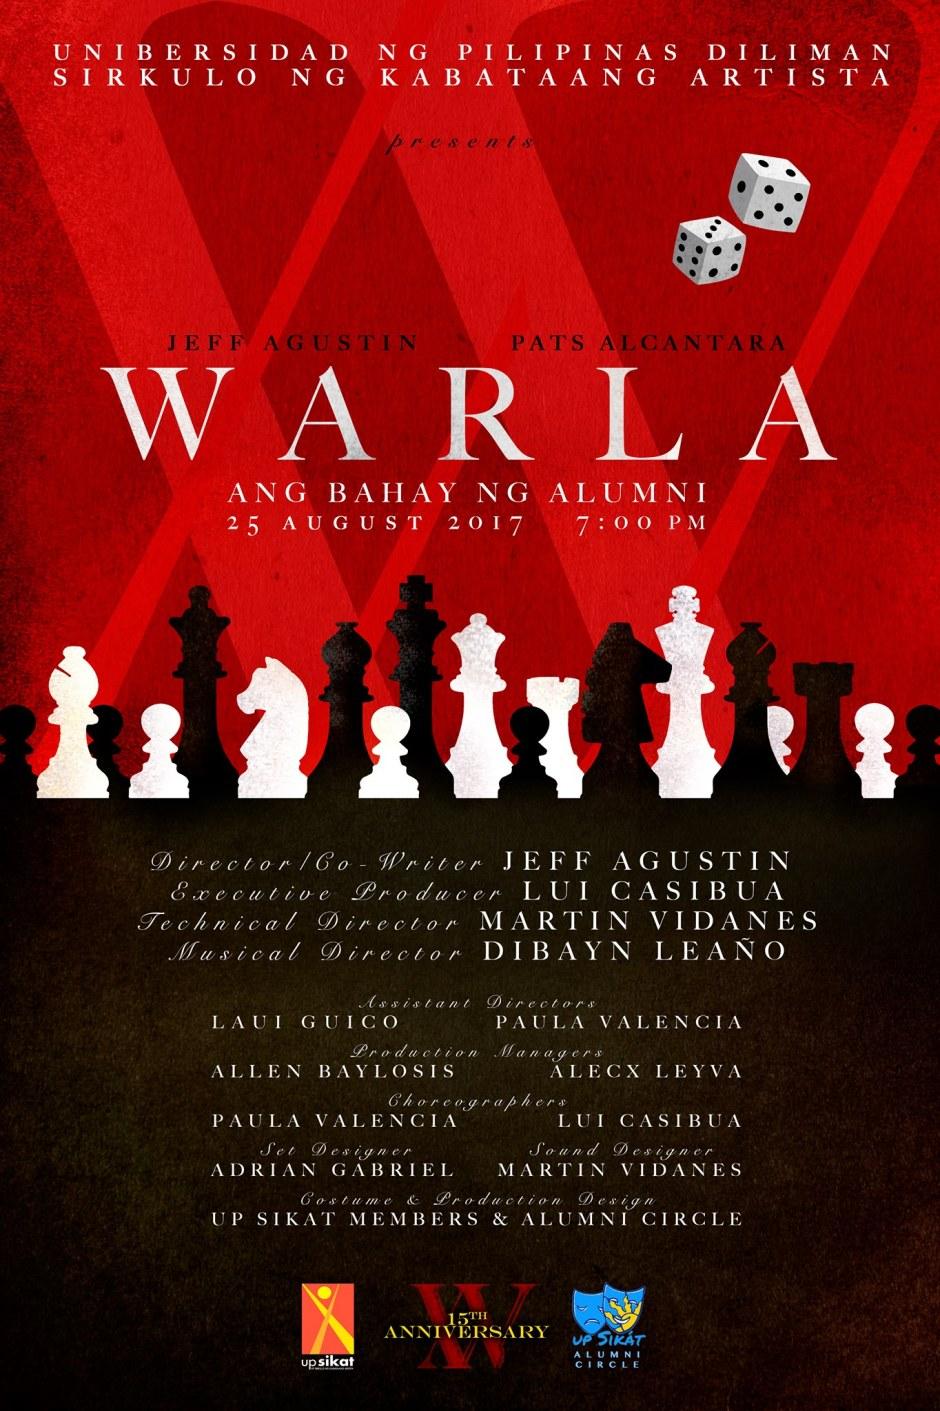 UP SIKAT presents WARLA